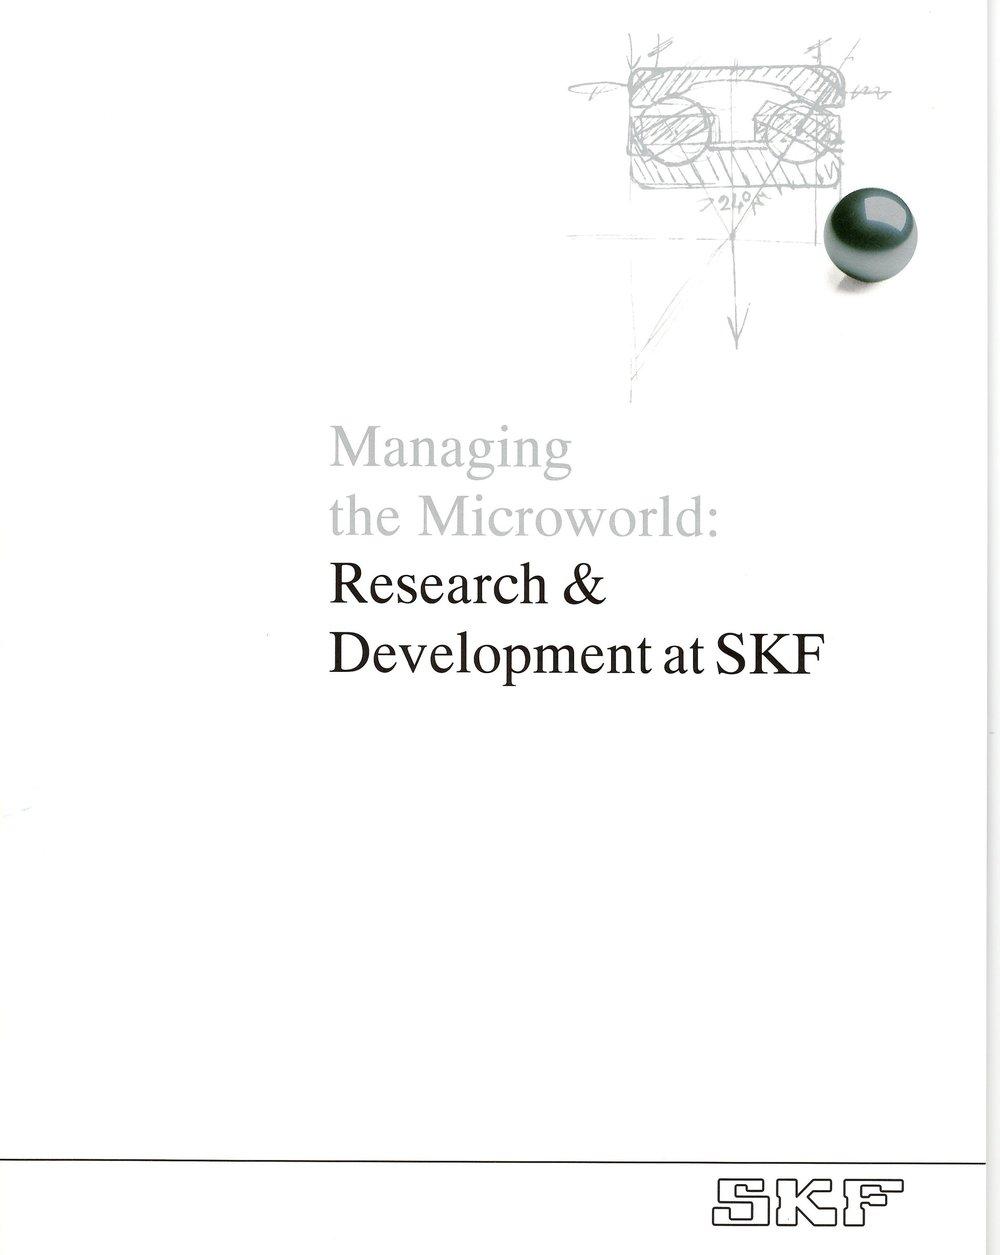 Research and Development Brochure (Detail Below)